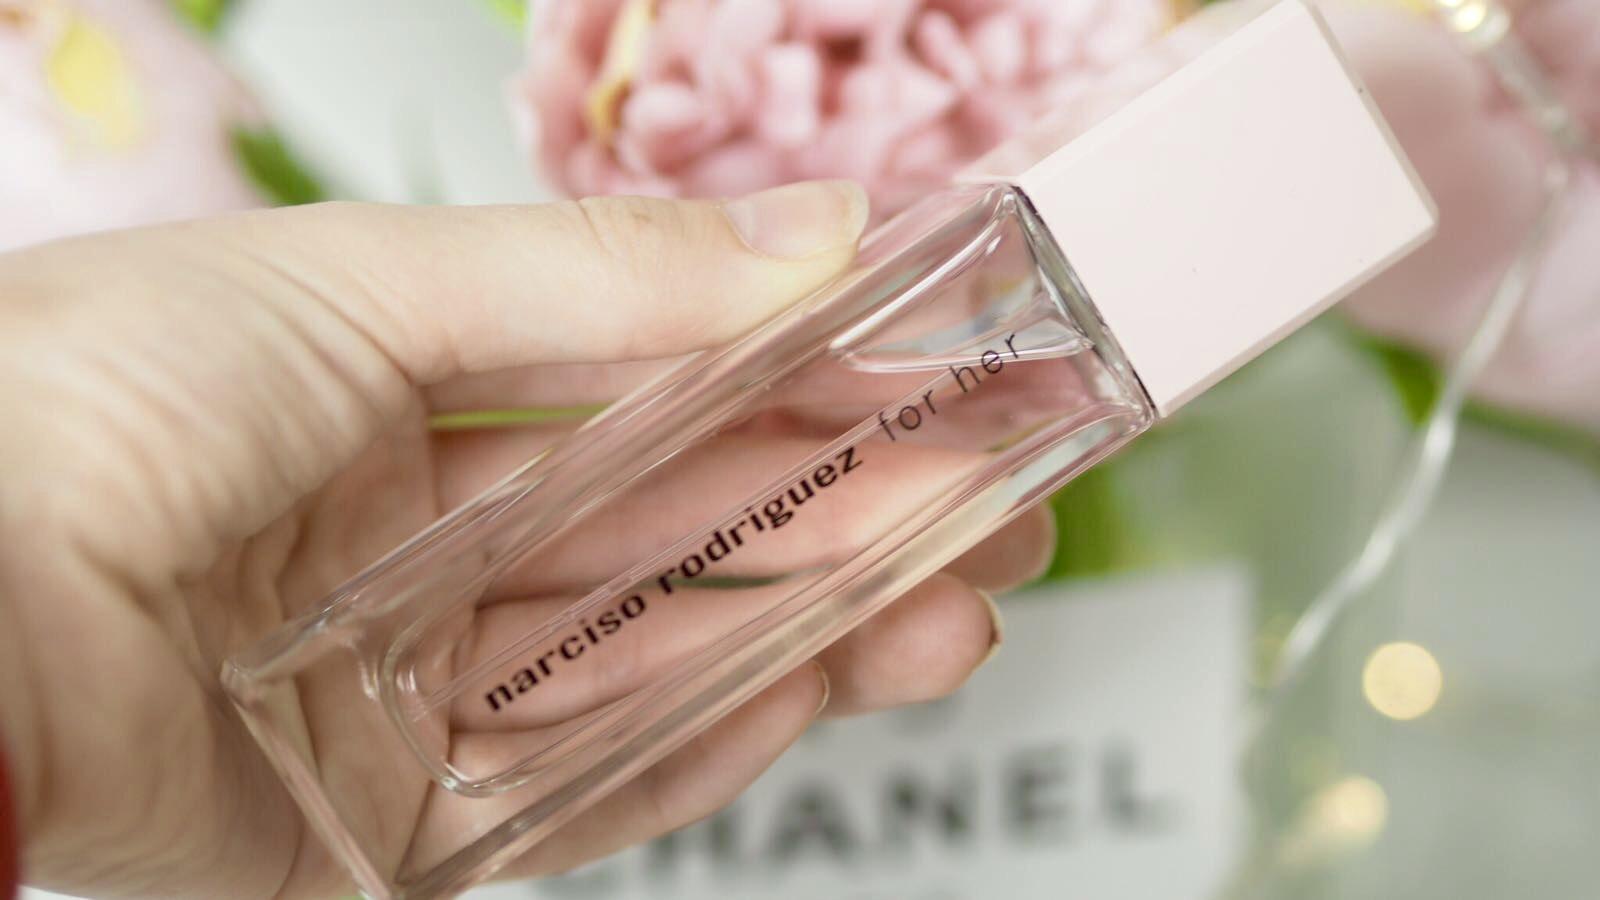 perfume, narcissi rodriguez